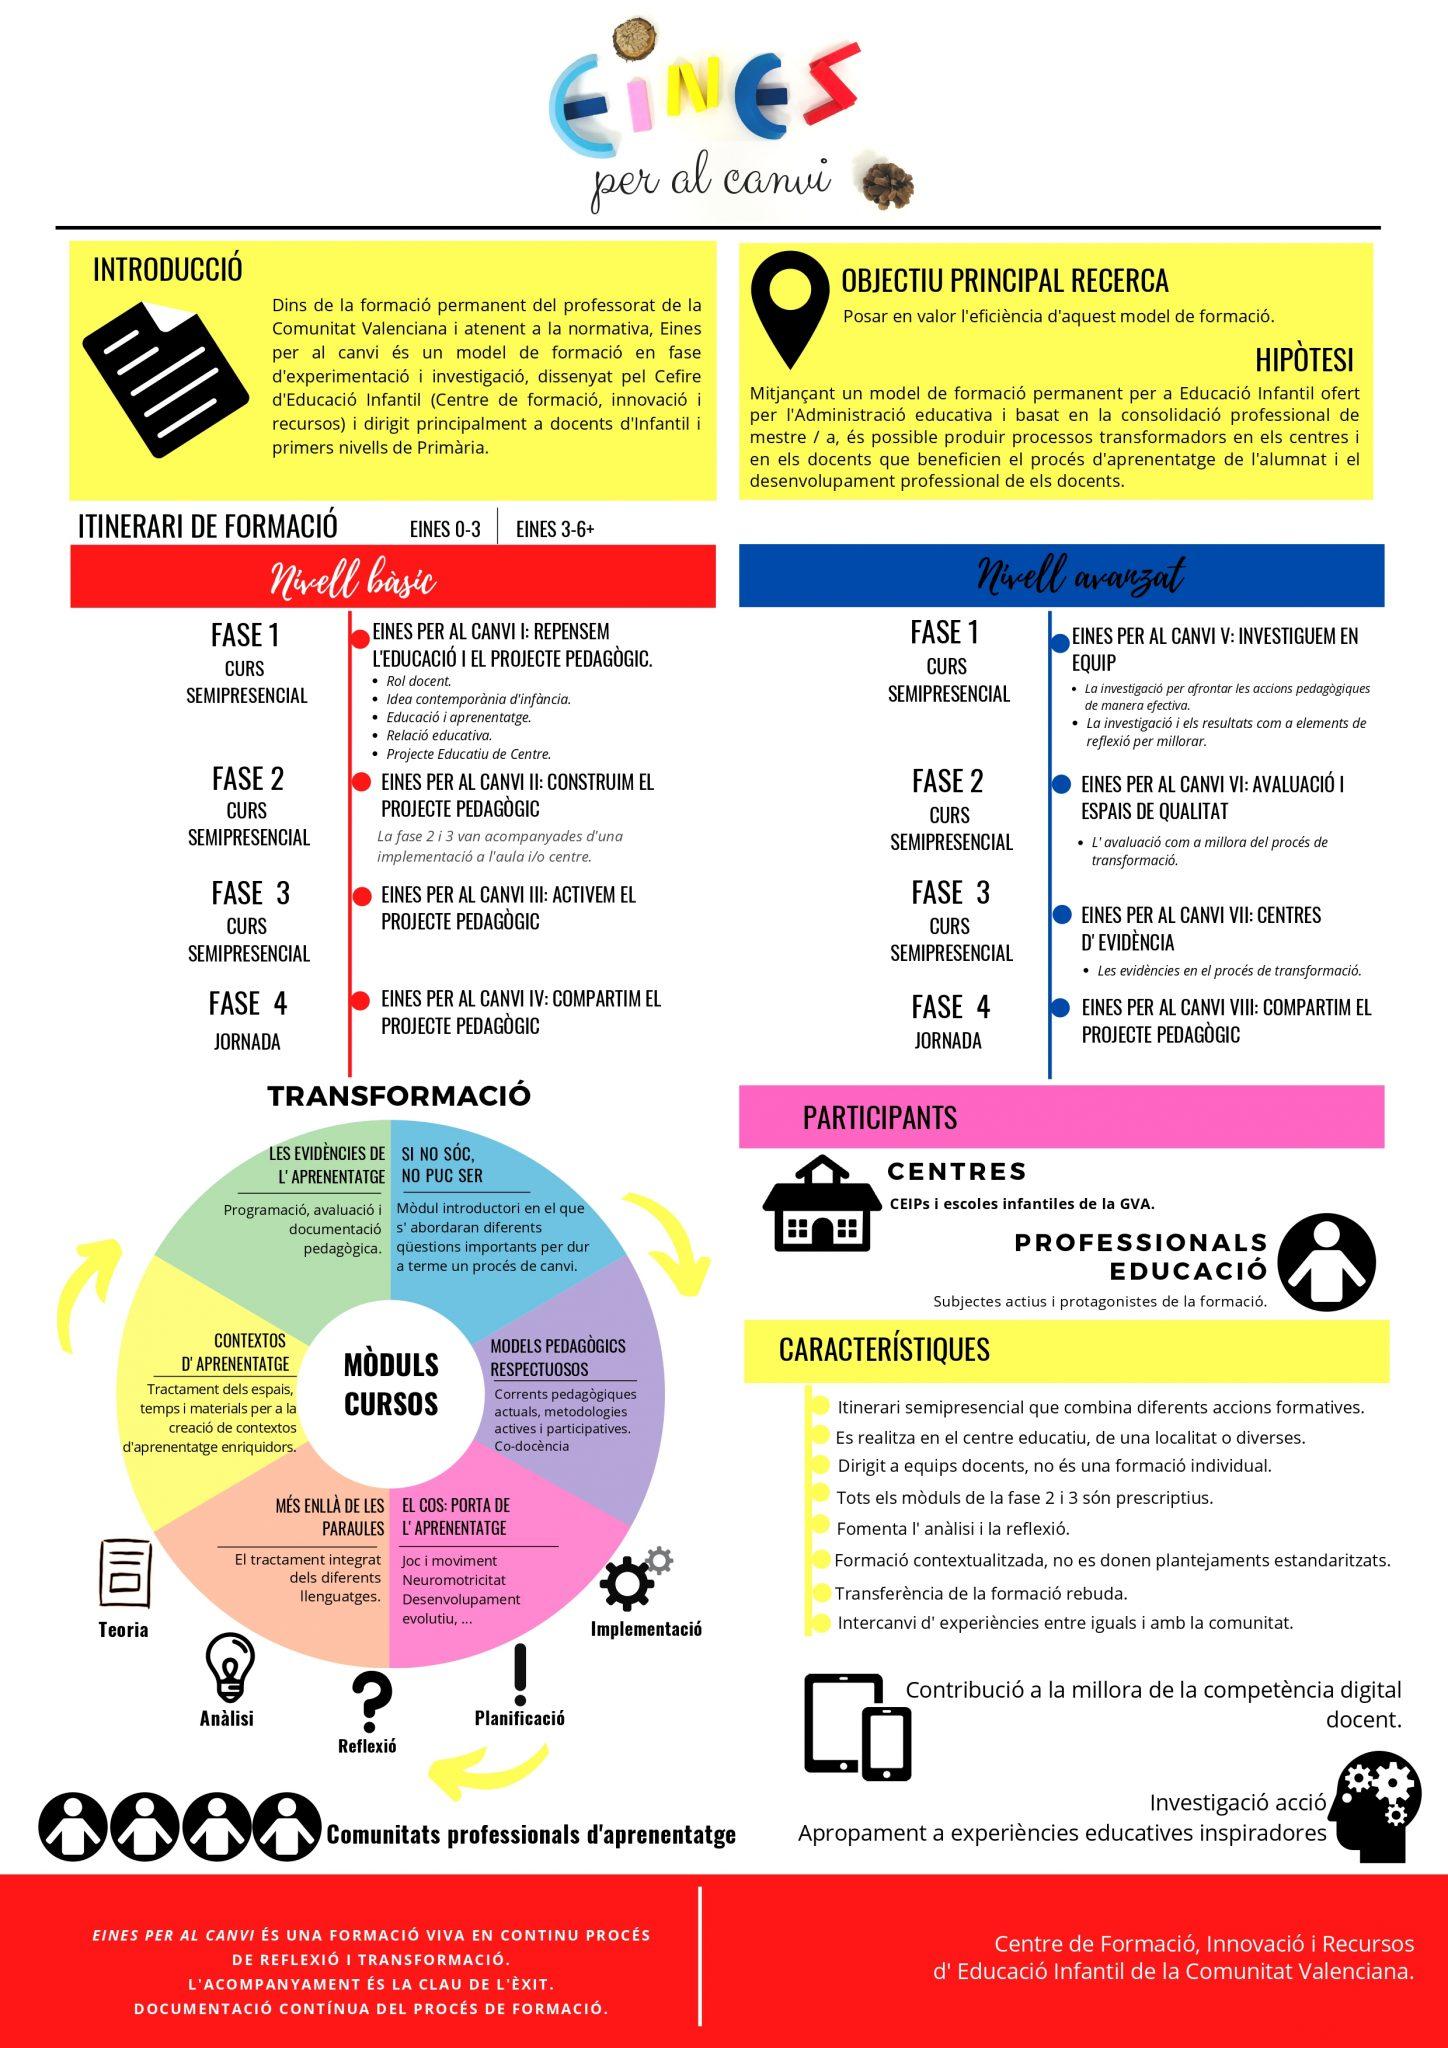 _PòSTER EINES PER AL CANVI-valencià_pages-to-jpg-0001